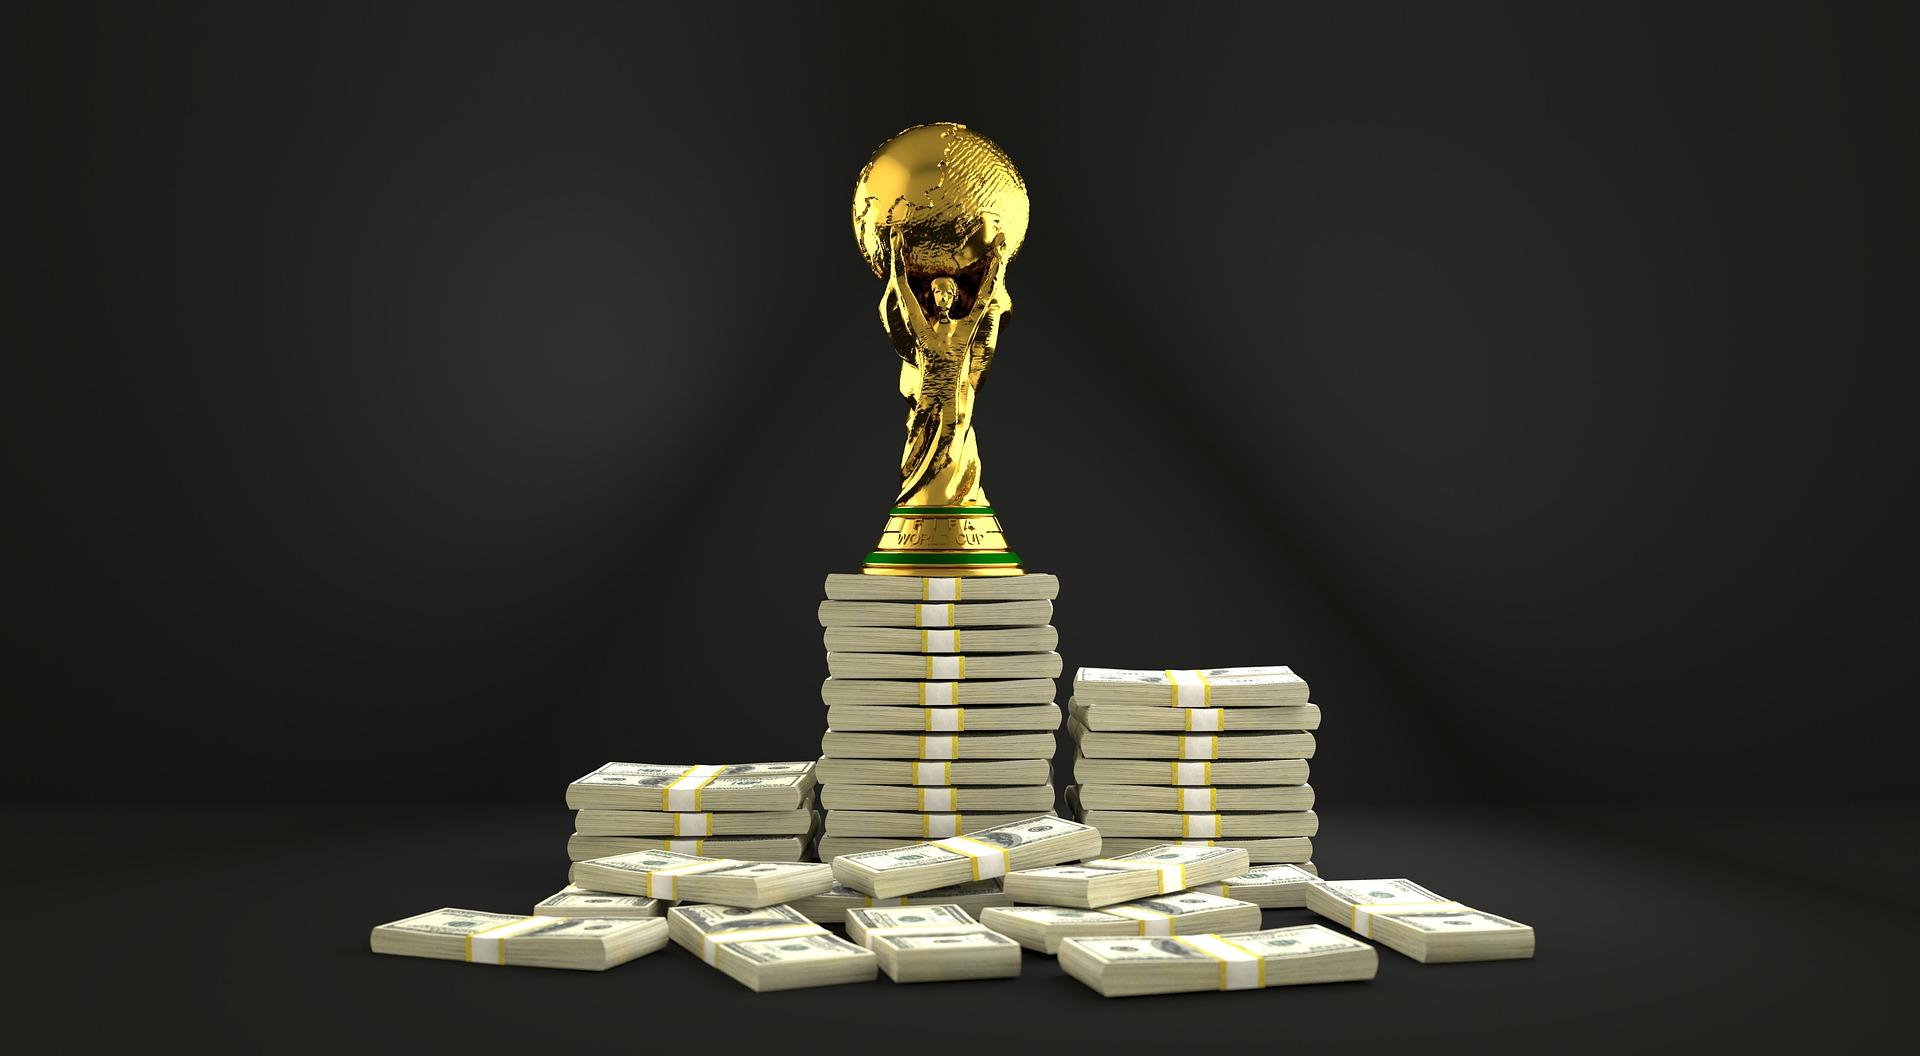 trophy-3457987_1920